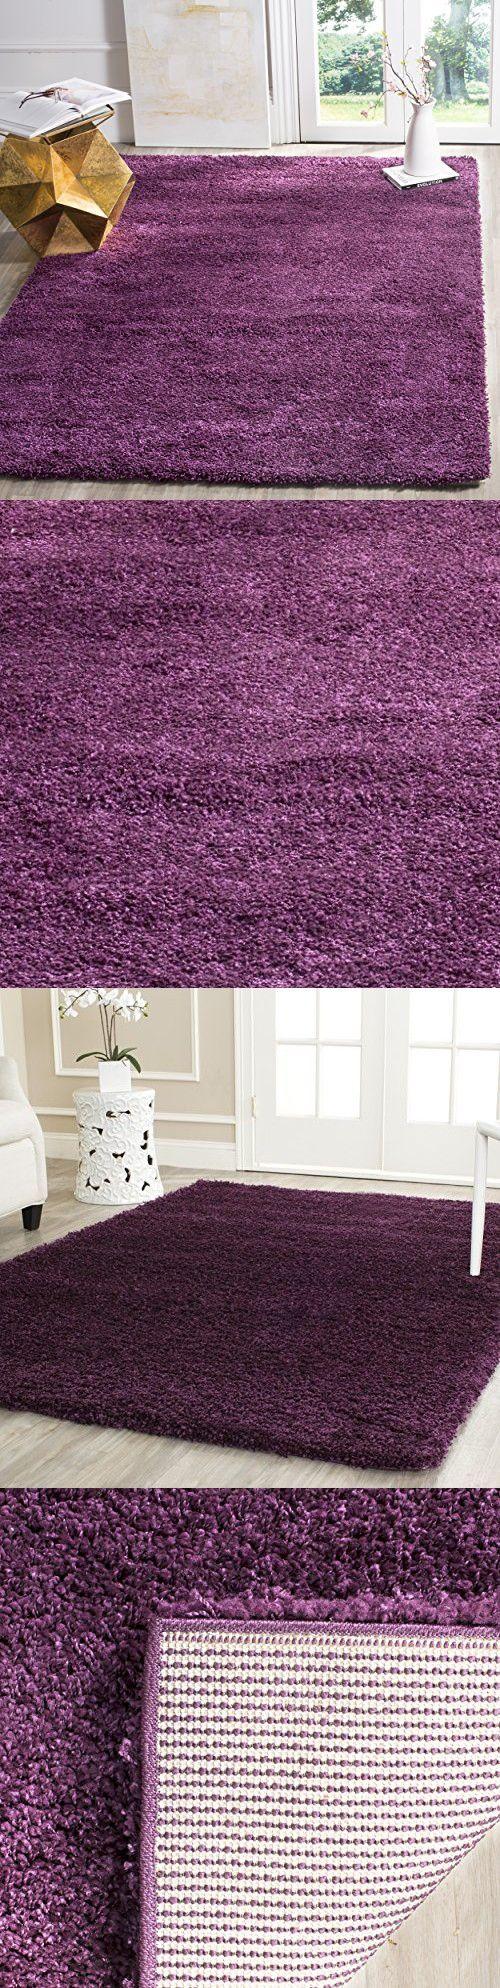 "Safavieh California Shag Collection SG151-7373 Purple Area Rug (5'3"" x 7'6"")"